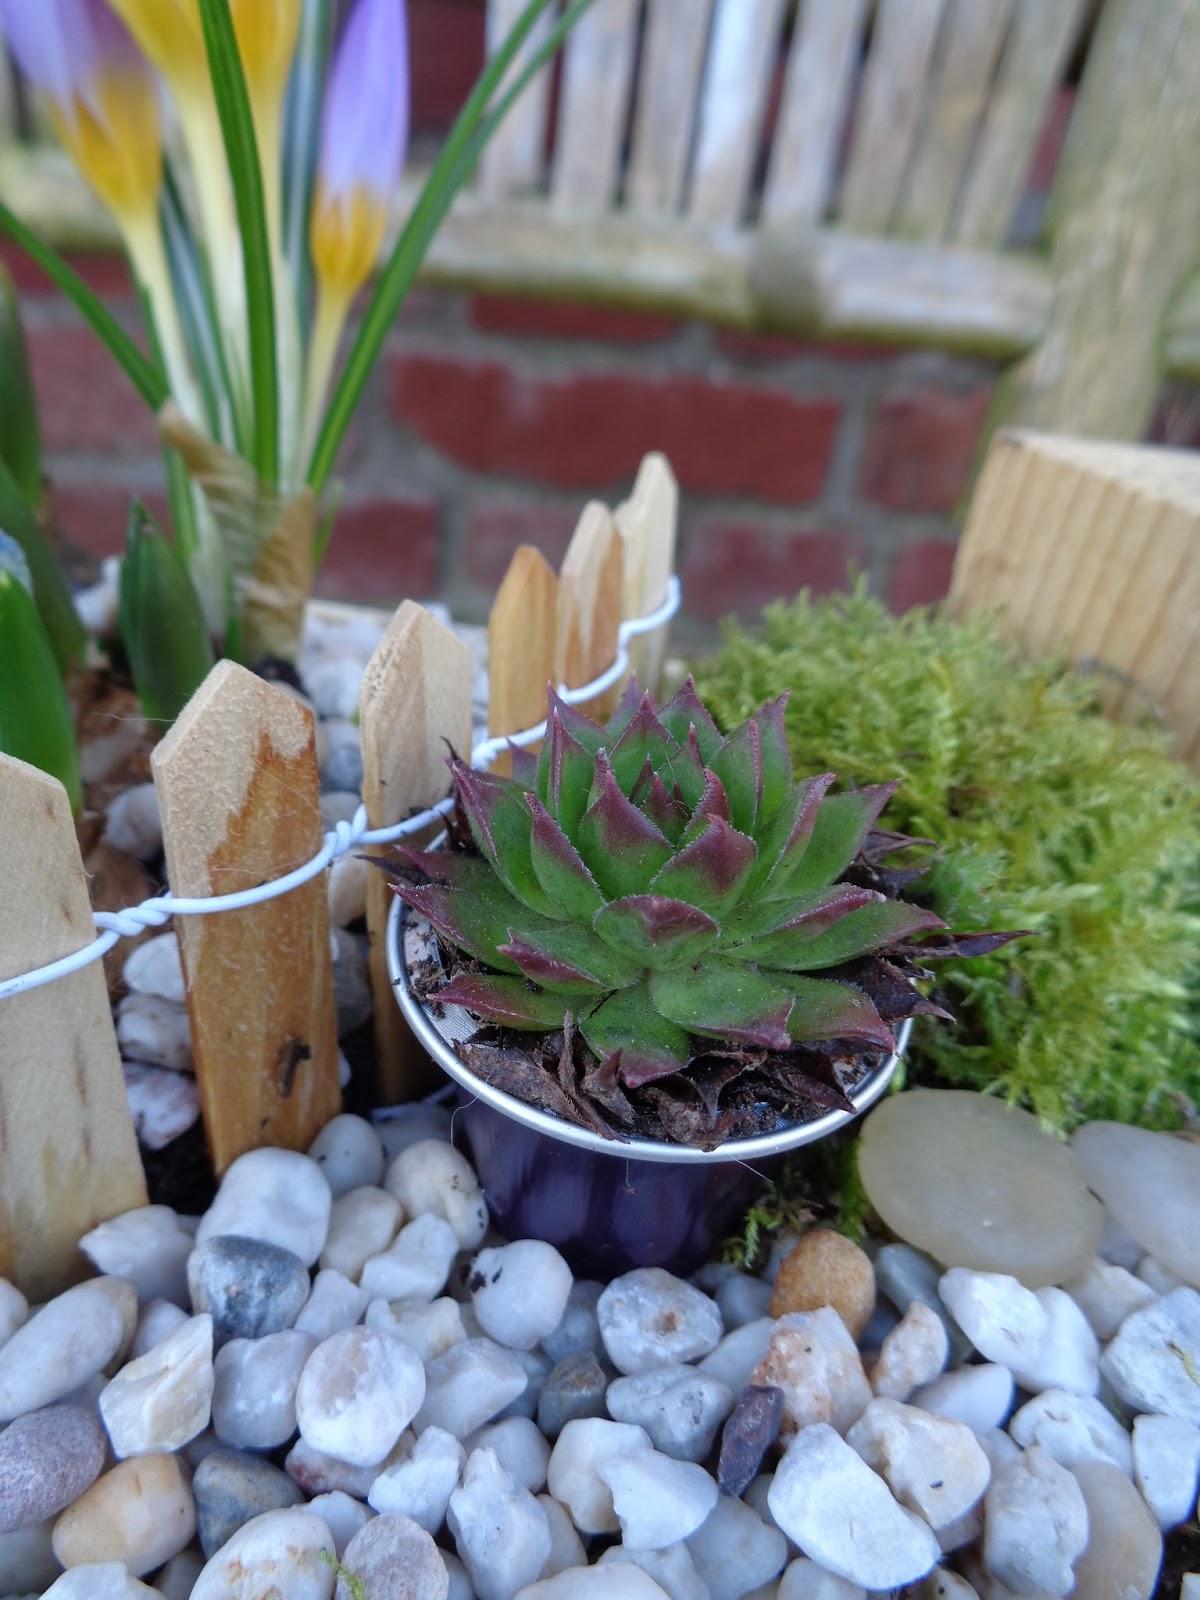 Coeur plein frigo vide mini jardin for Vide jardin finistere 2015